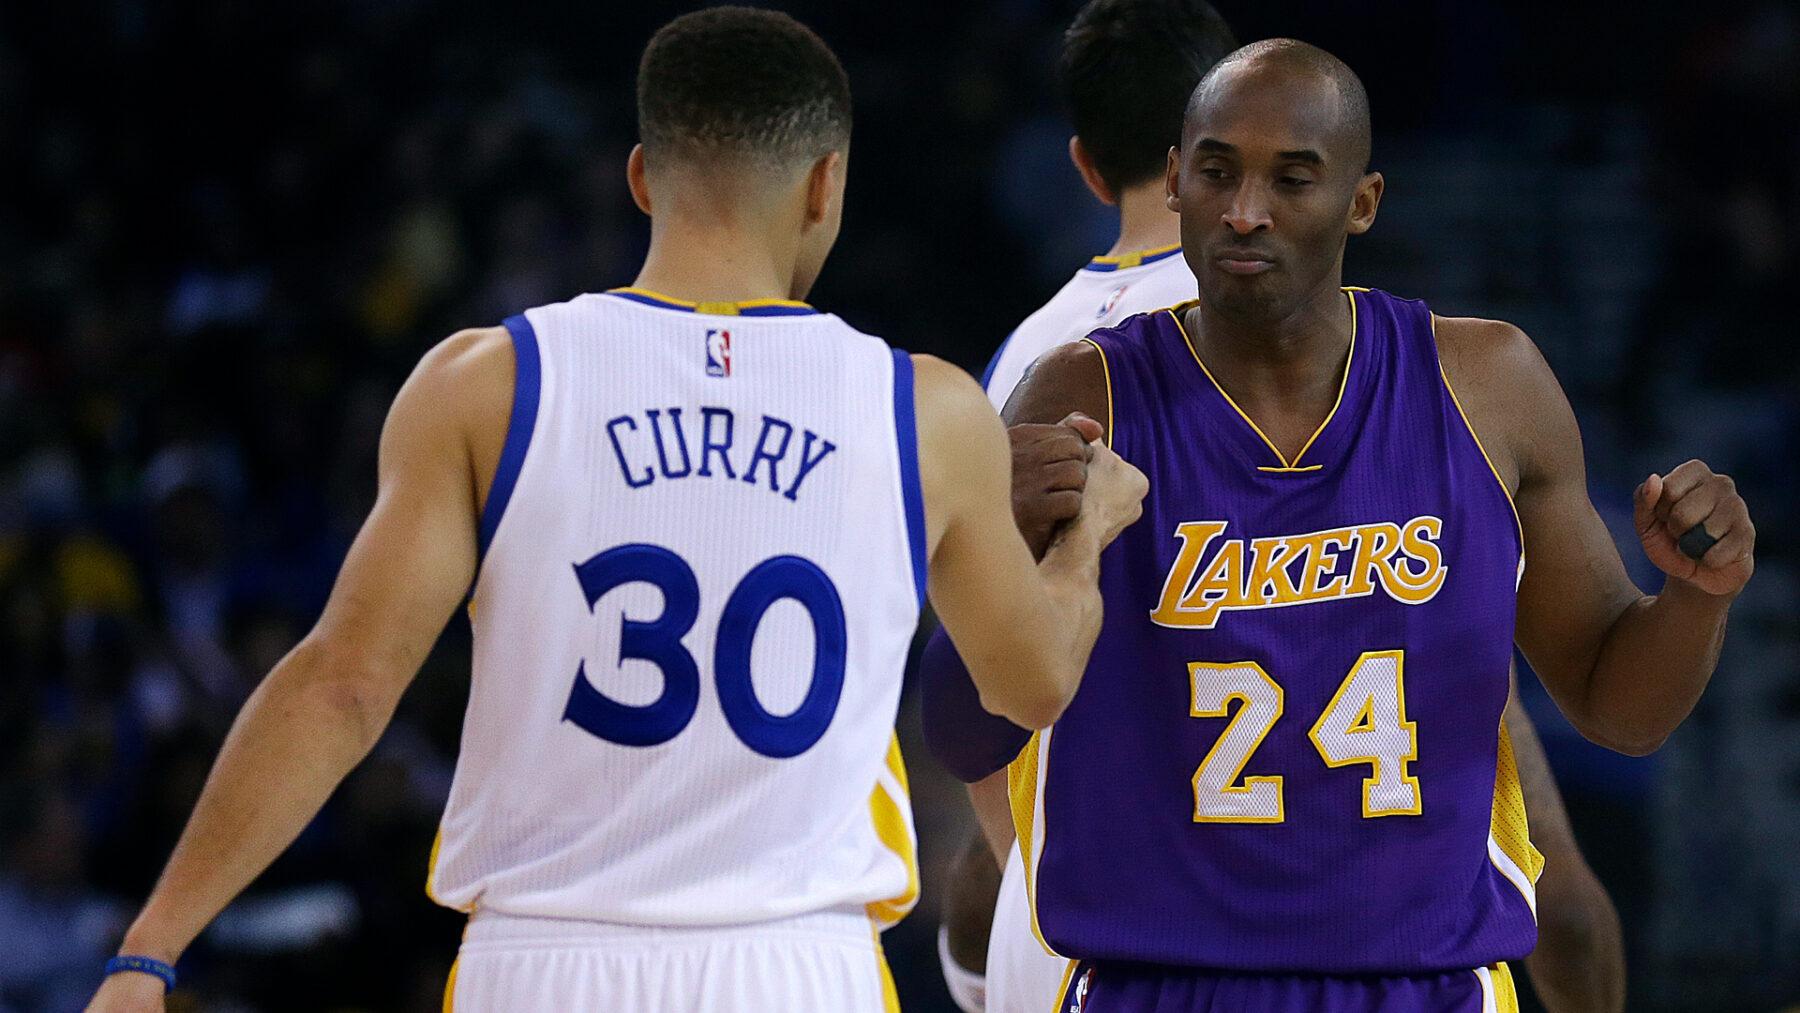 Stephen Curry and Kobe Bryant